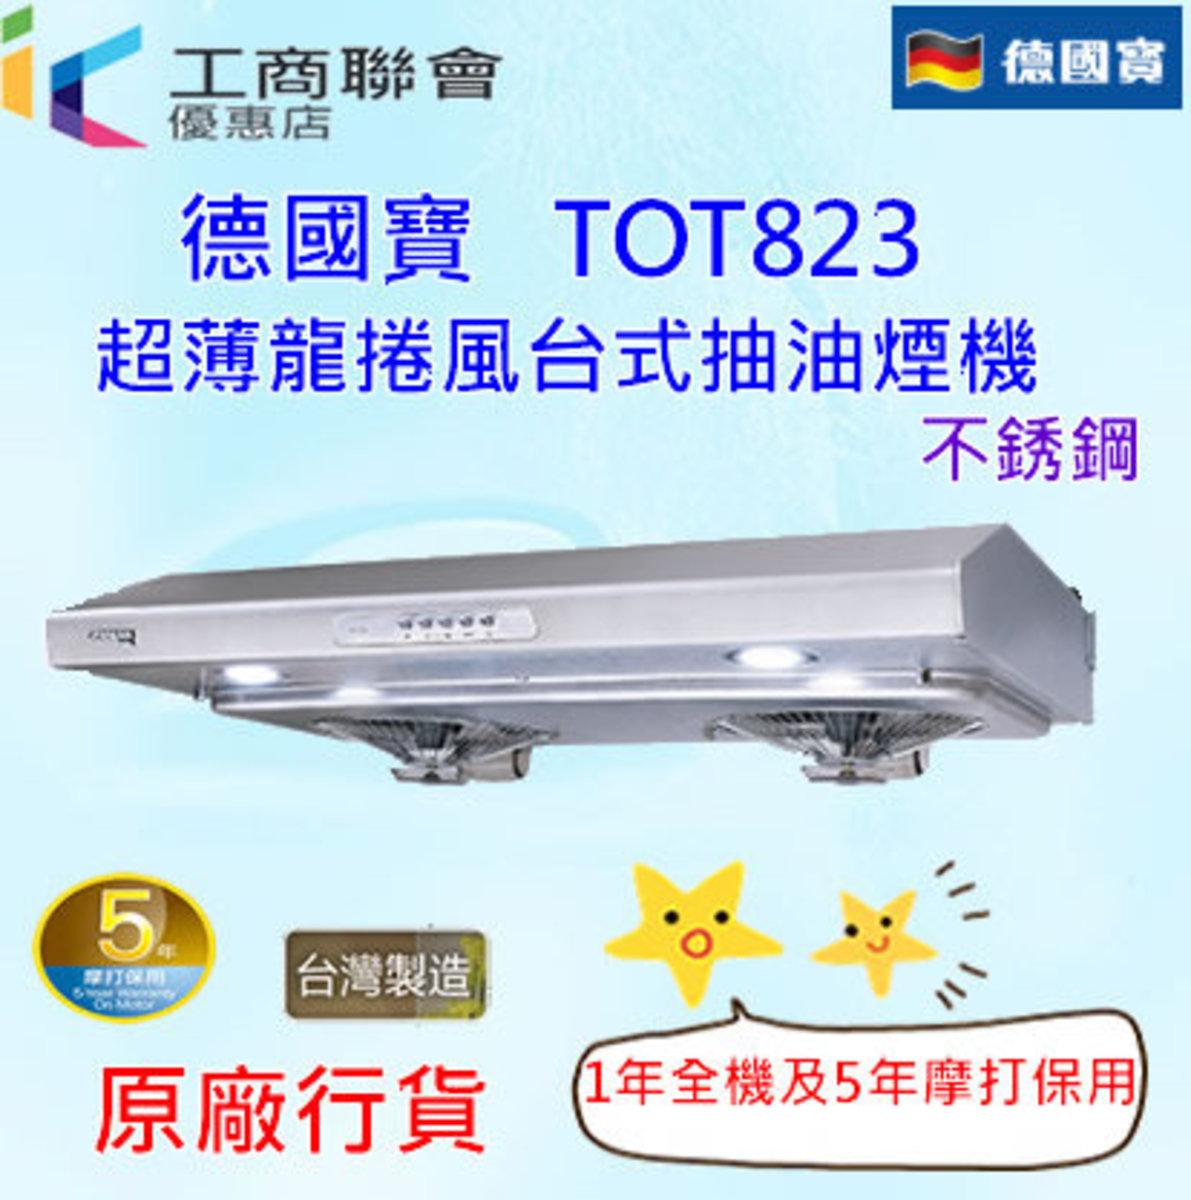 TOT823 超薄龍捲風台式抽油煙機